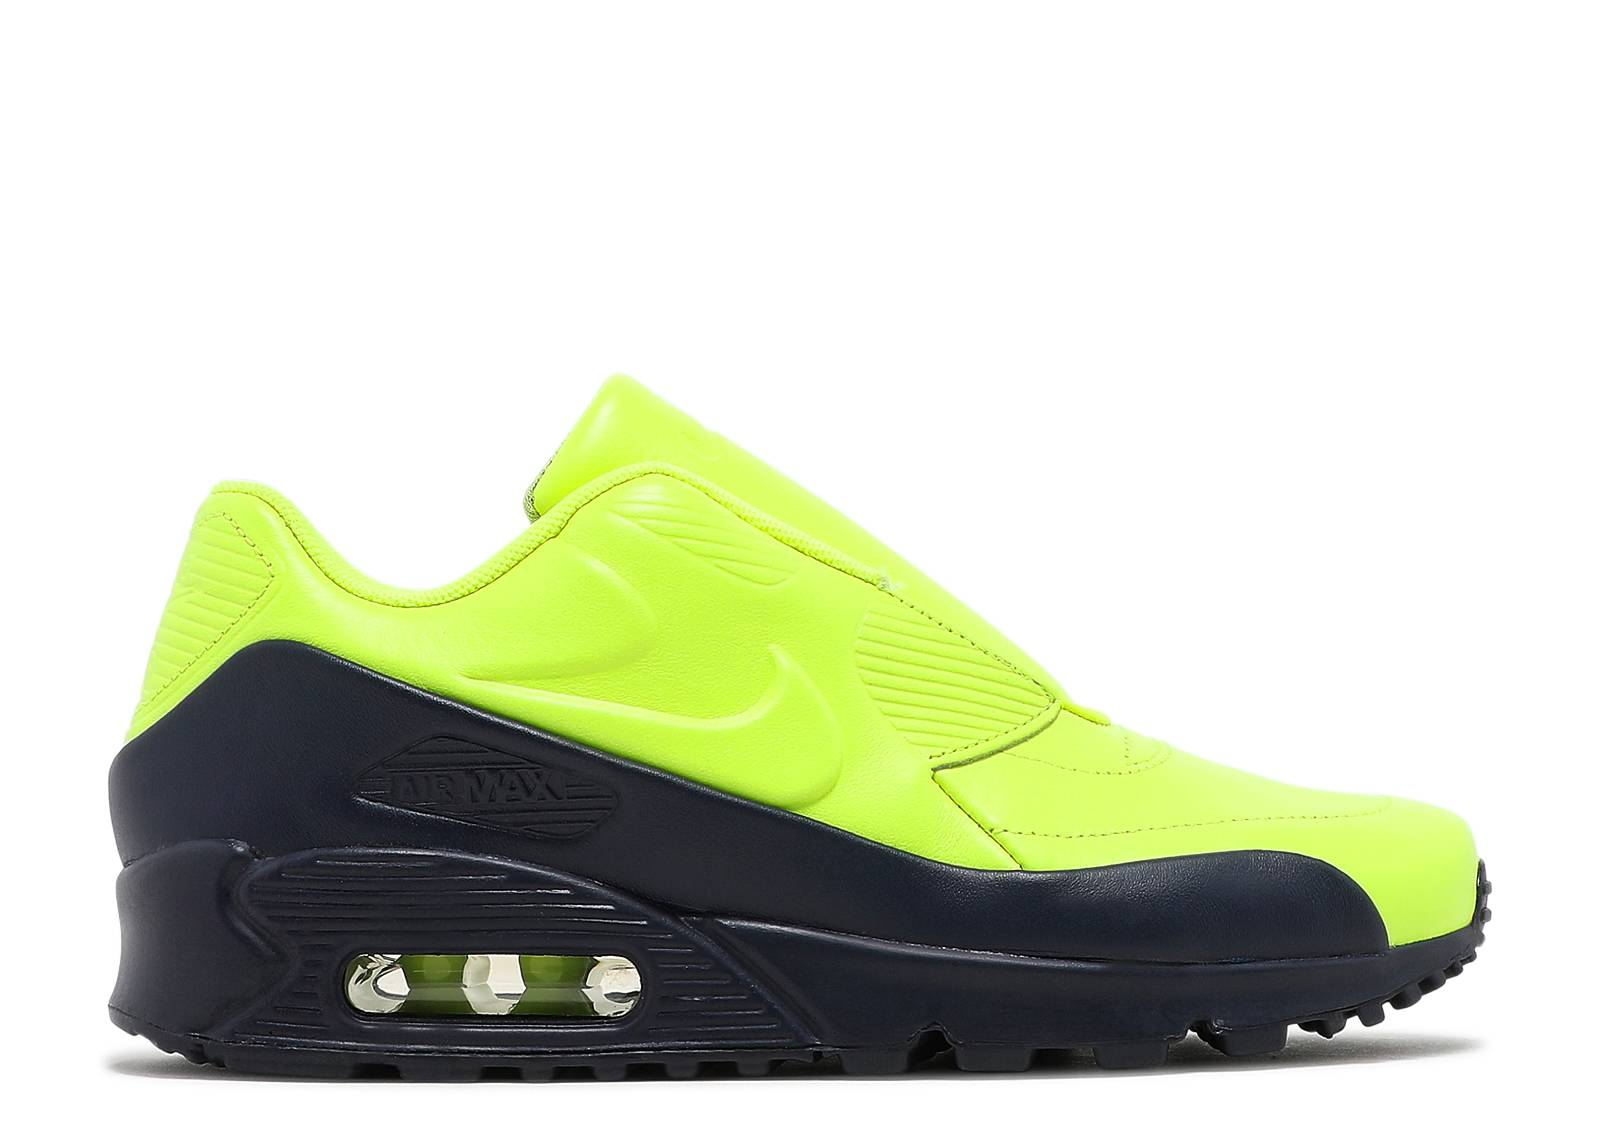 air max 90 sneakerboot sp flight club